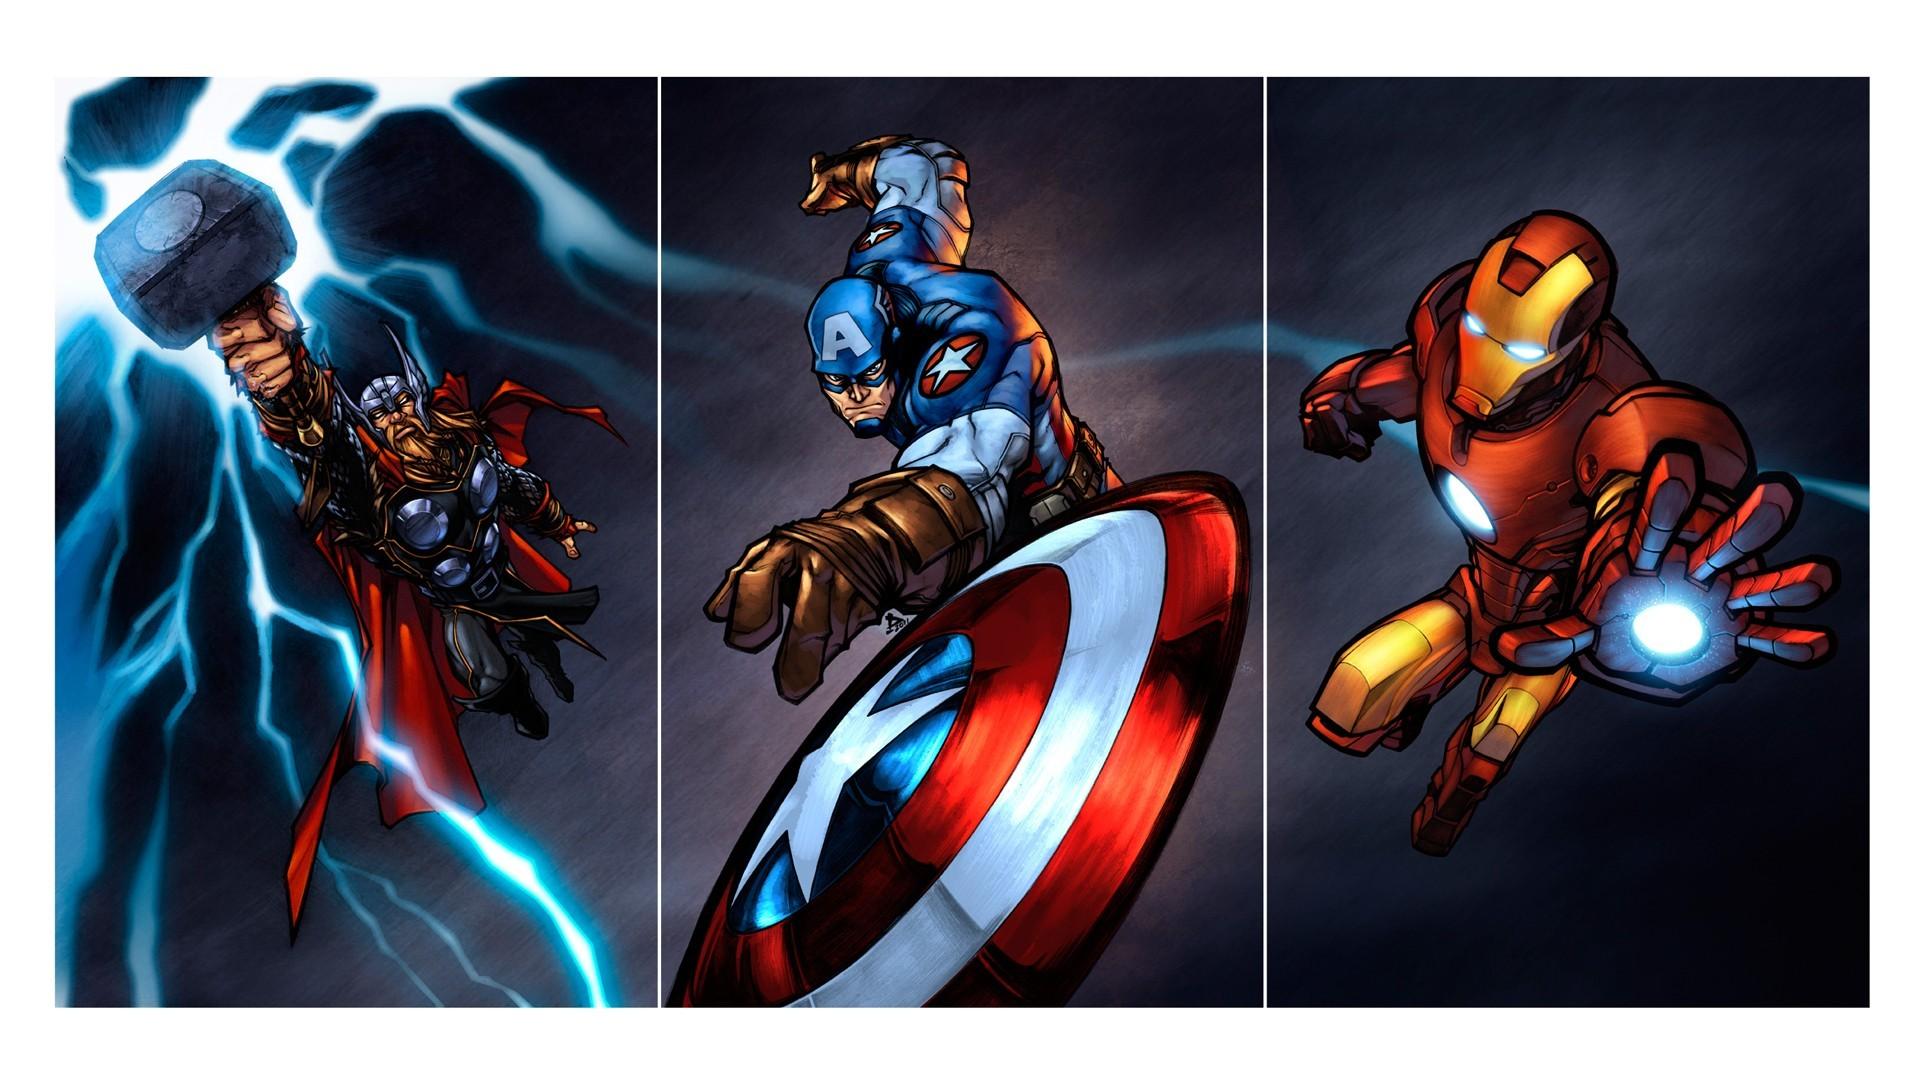 49+ Avengers Cartoon Wallpaper on WallpaperSafari